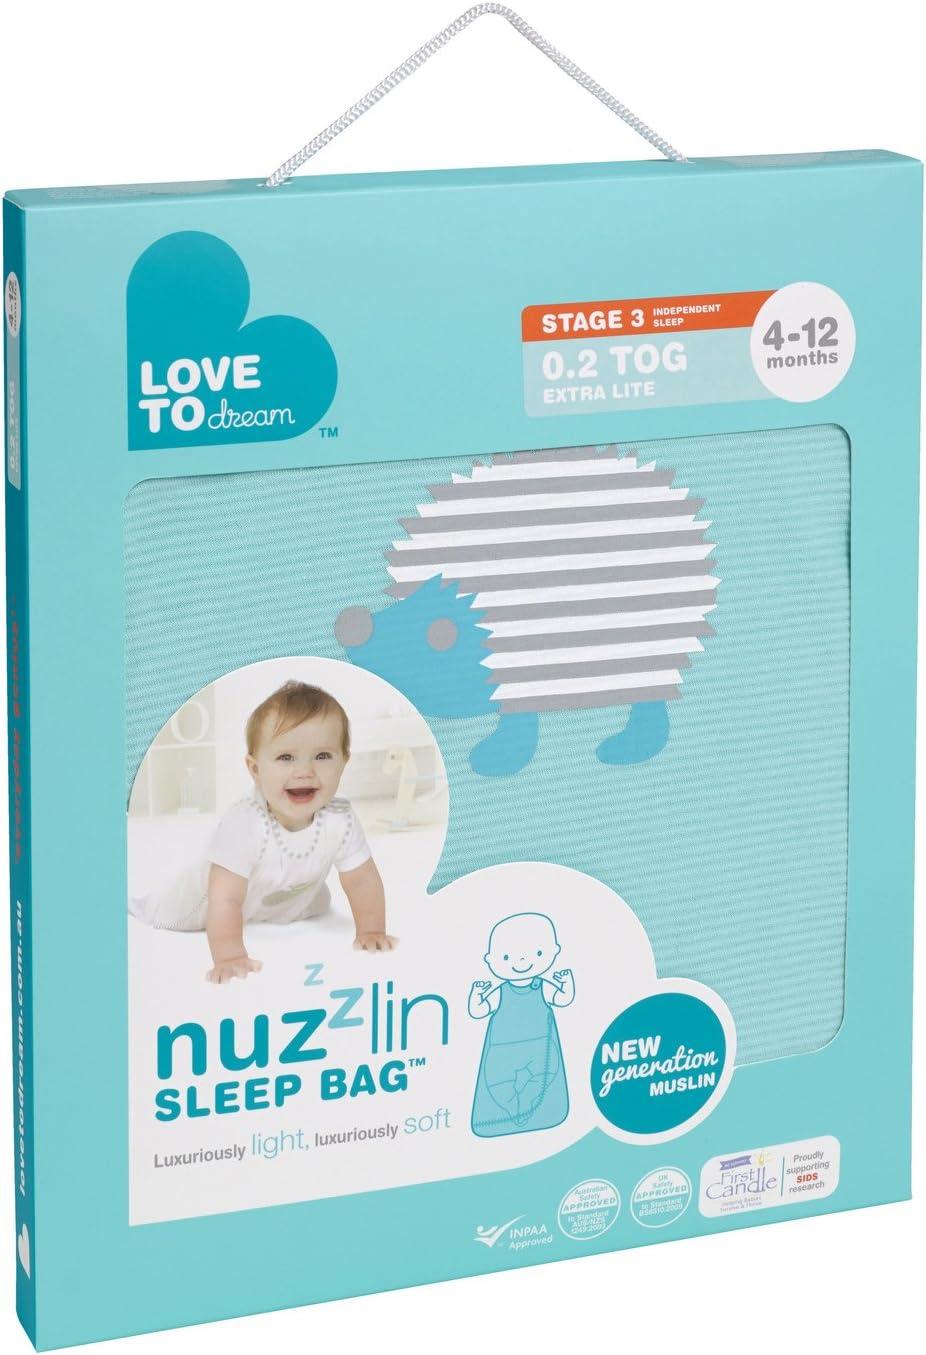 Love To Dream Nuzzlin Sleep Bag 0.2 Tog Aqua, 4-12 Months